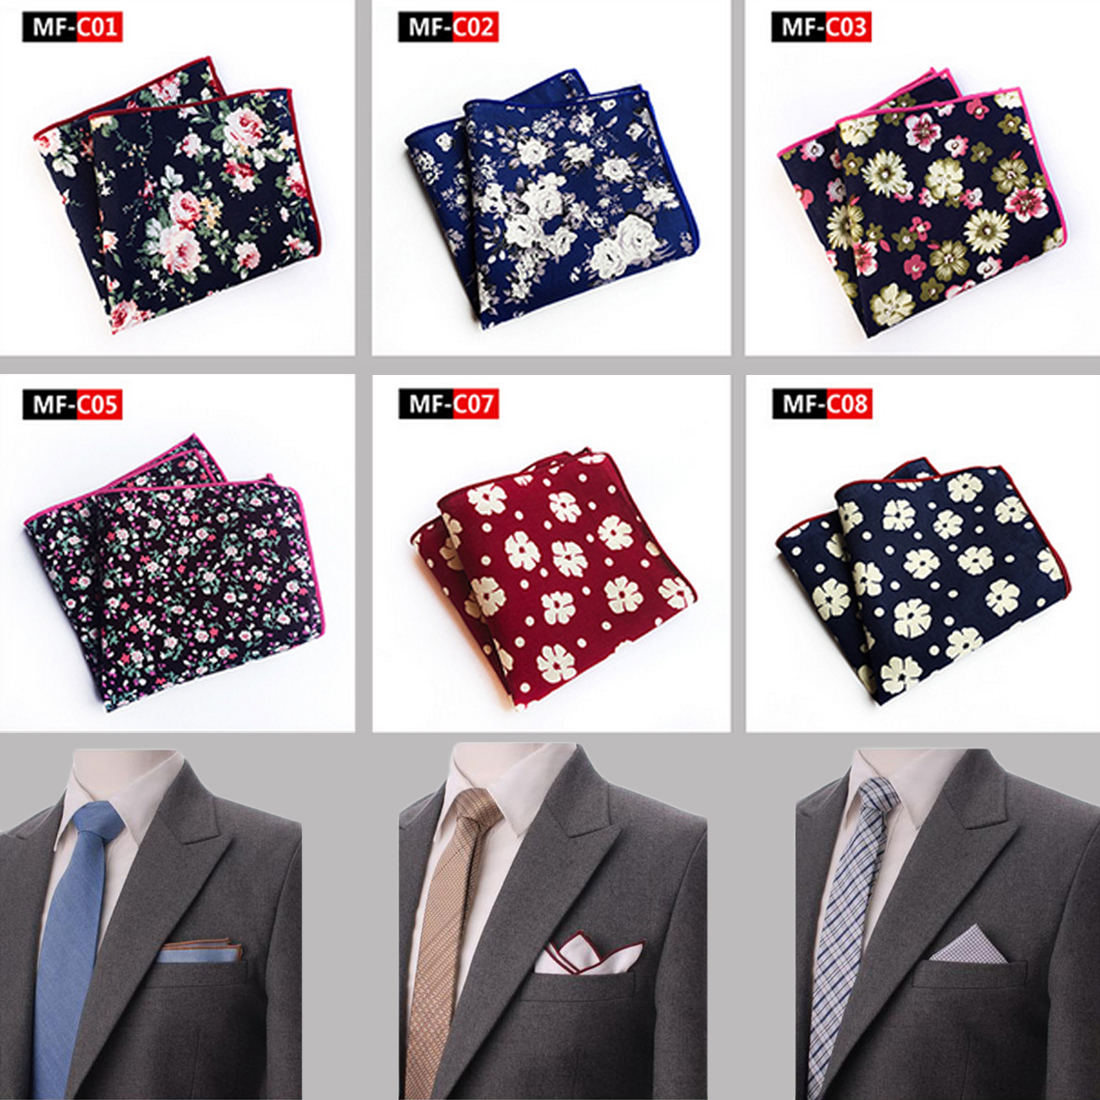 Comfortable Men's Cotton Pocket Square Western Style Floral Handkerchief For Suit Pocket Wedding Square Paisley 25x25cm